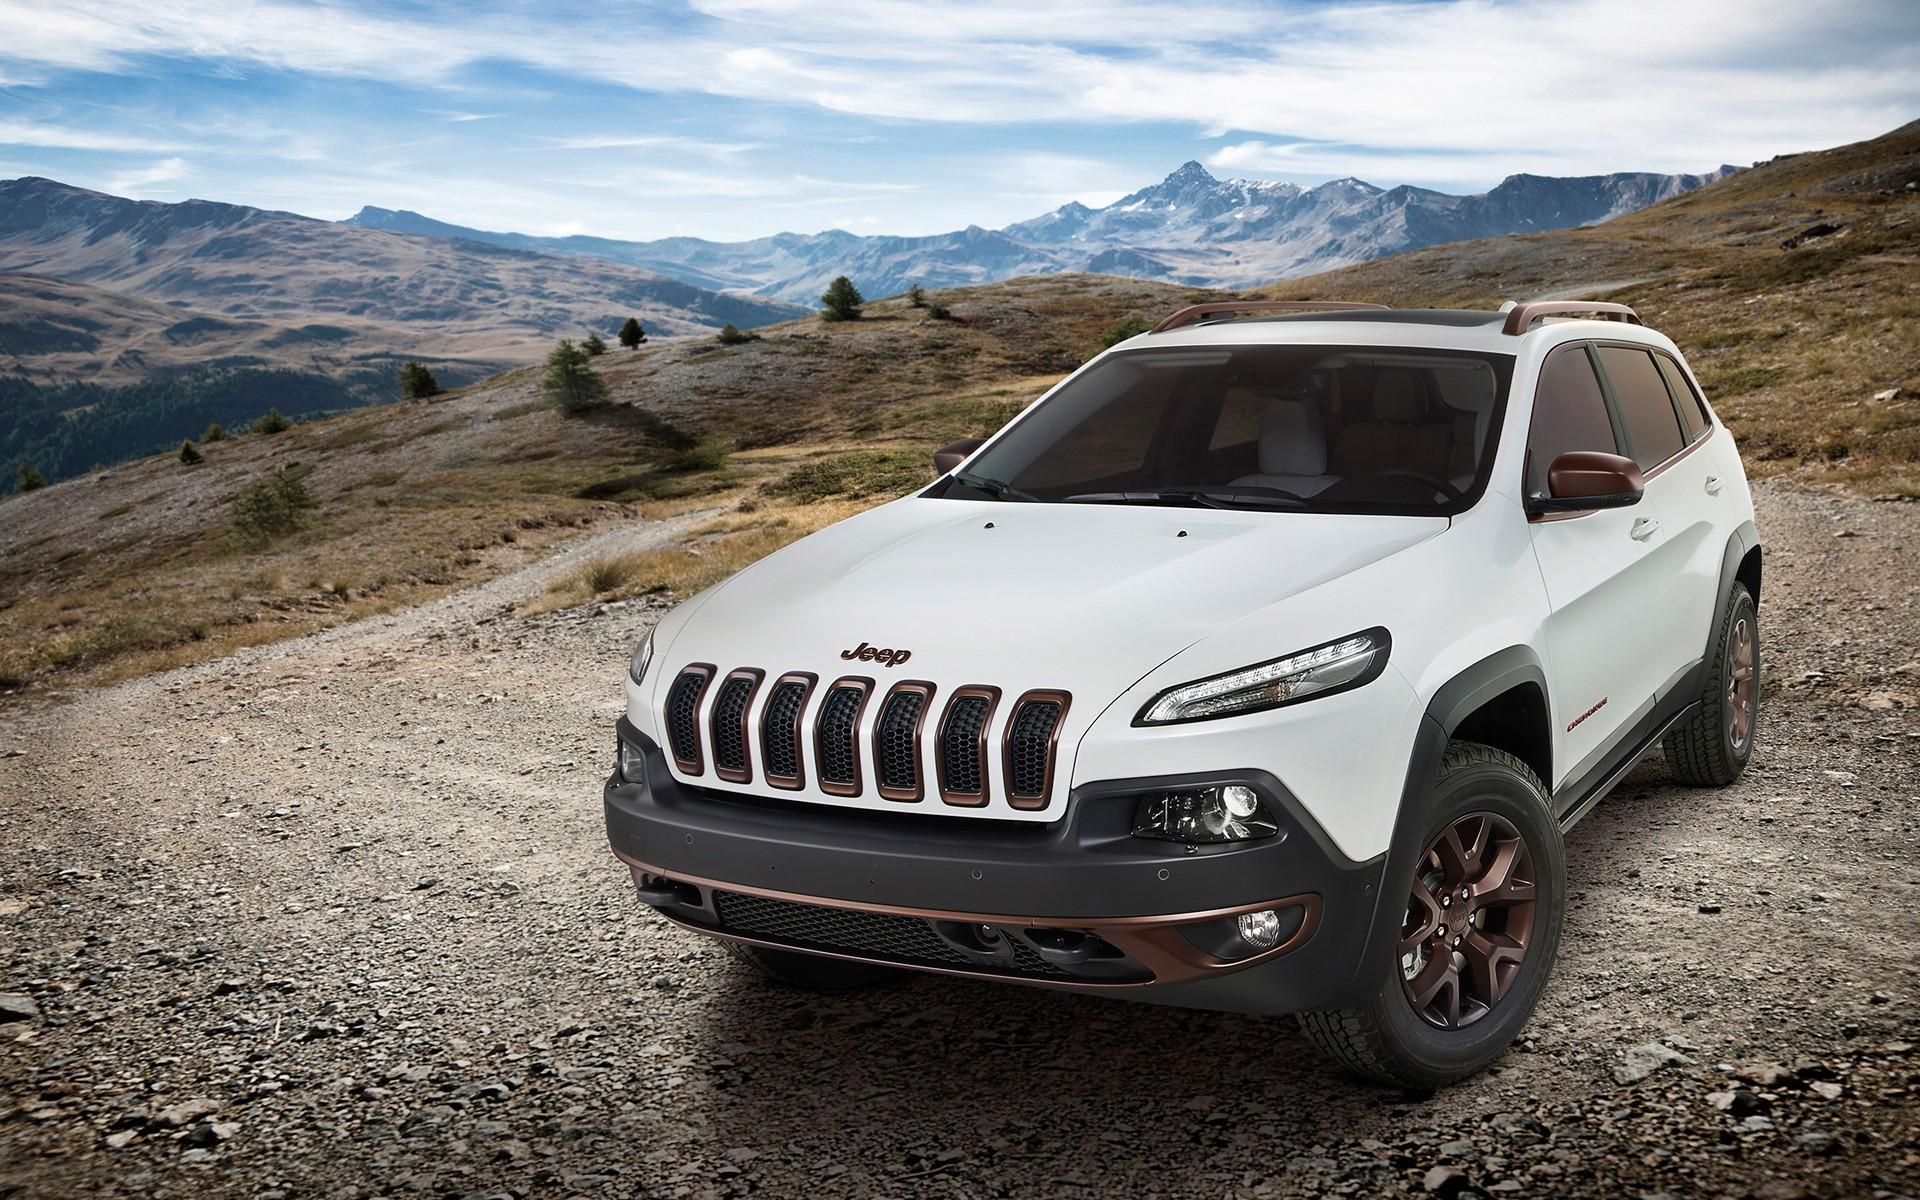 Latest Car Wallpaper 2014 2014 Jeep Cherokee Sageland Concept 2 Wallpaper Hd Car